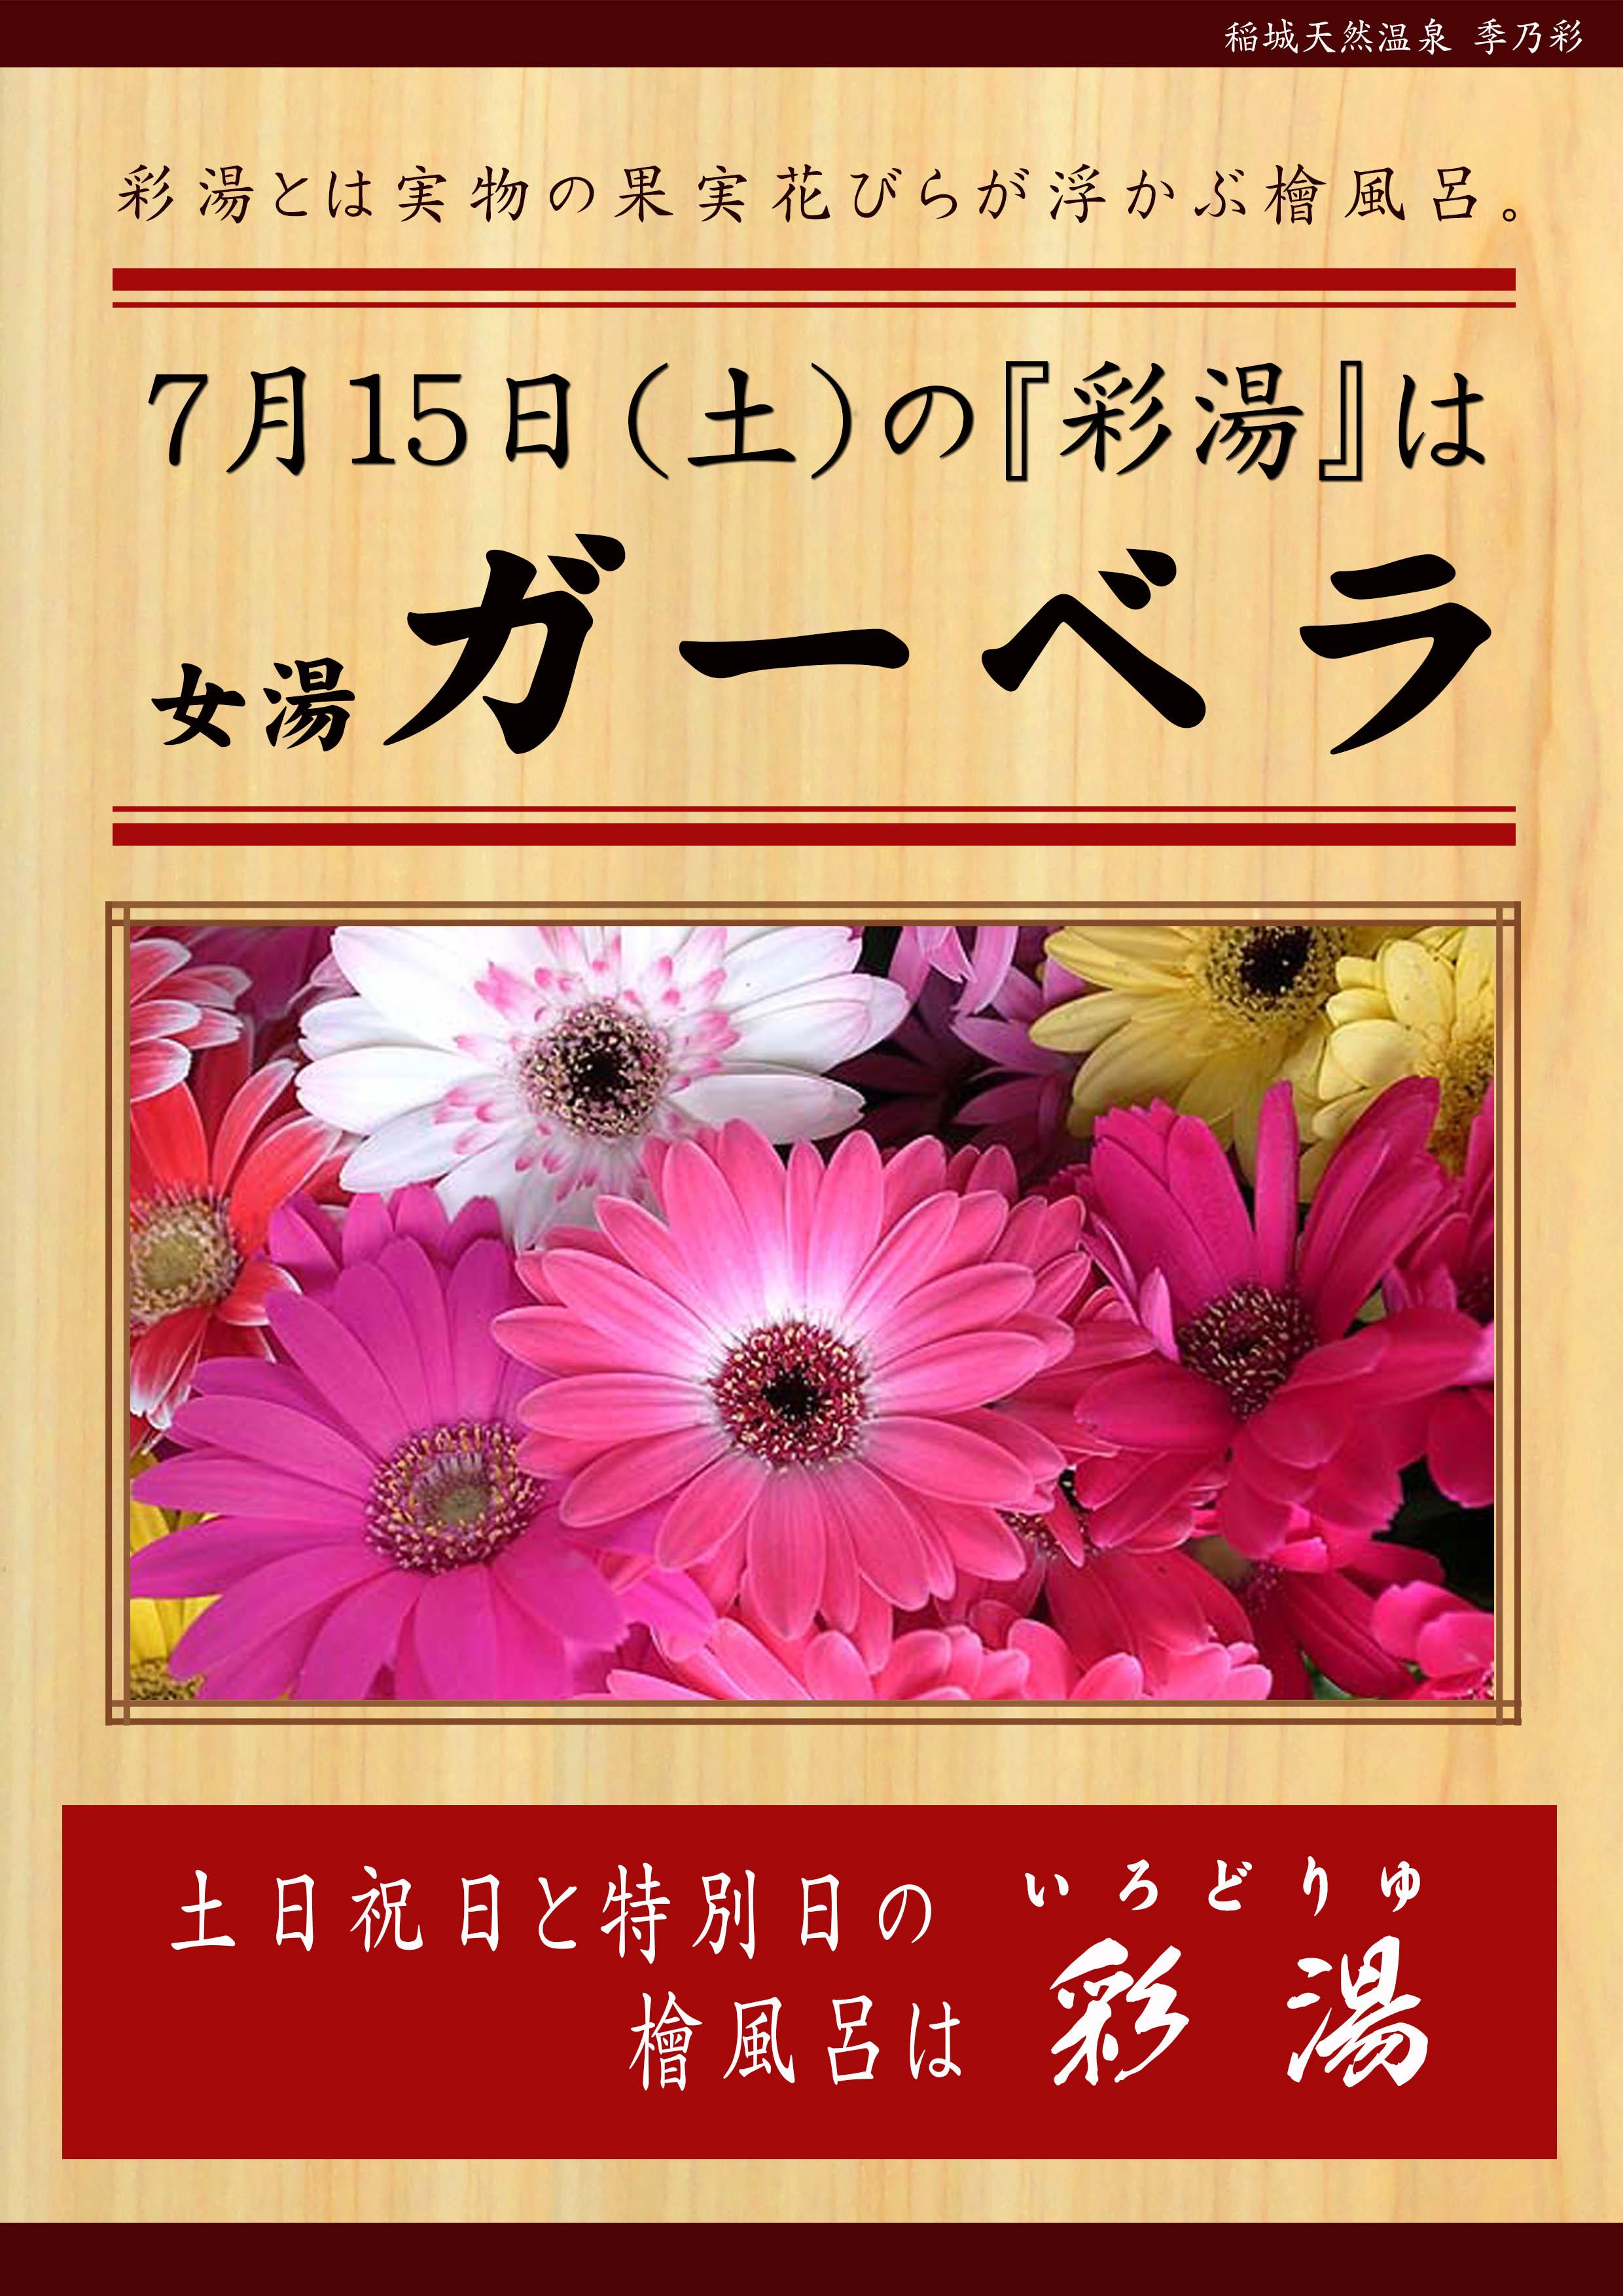 20170715POP イベント 彩湯 女湯 ガーベラ